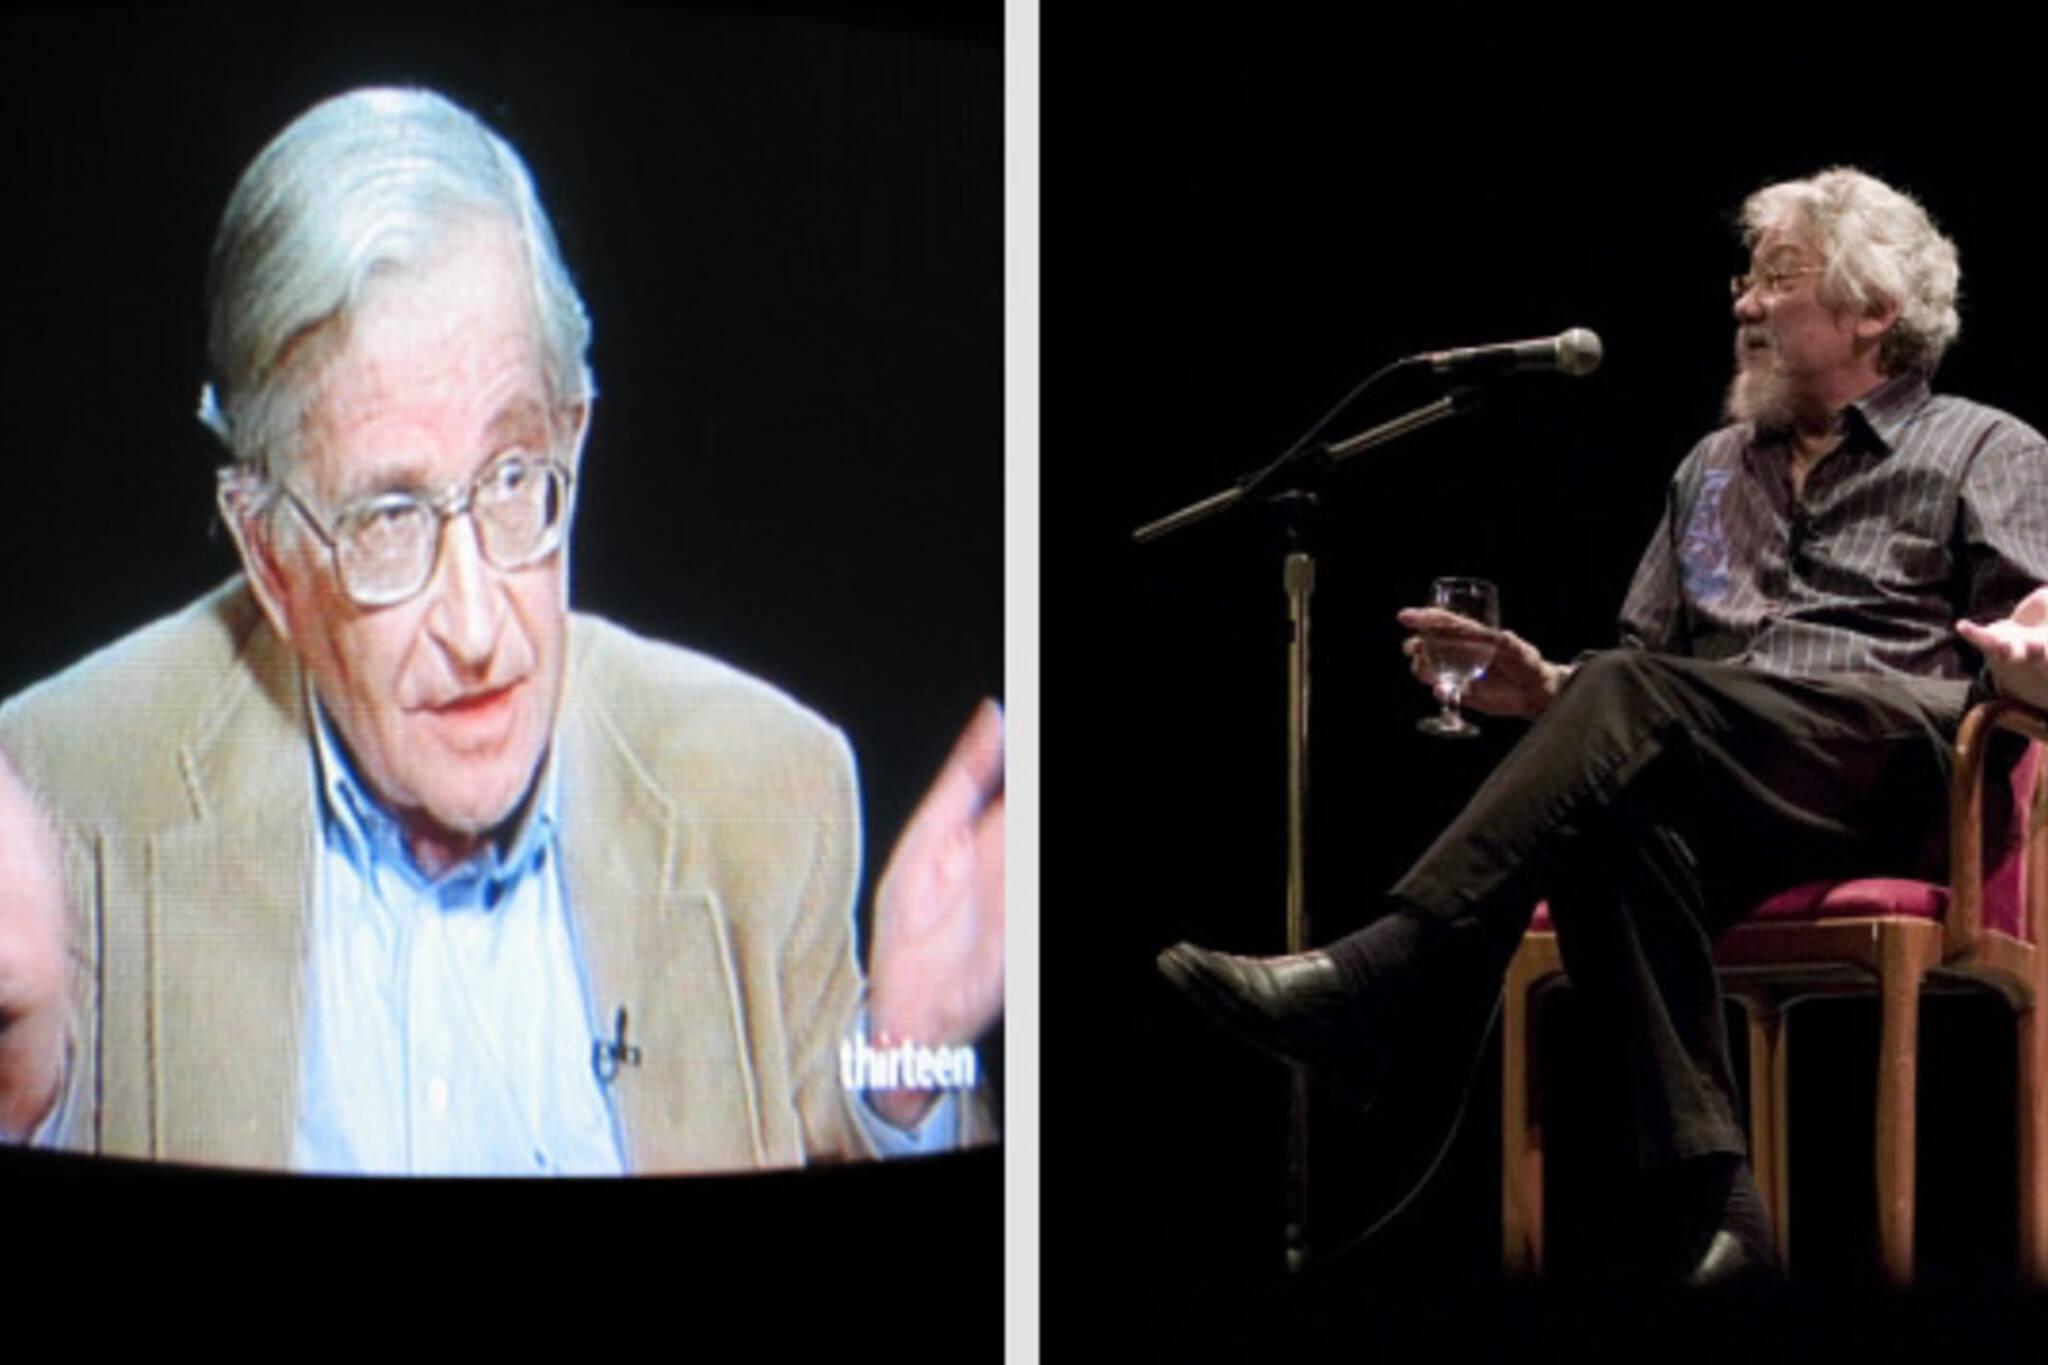 TV Screen Noam Chomsky shrugs with David Suzuki